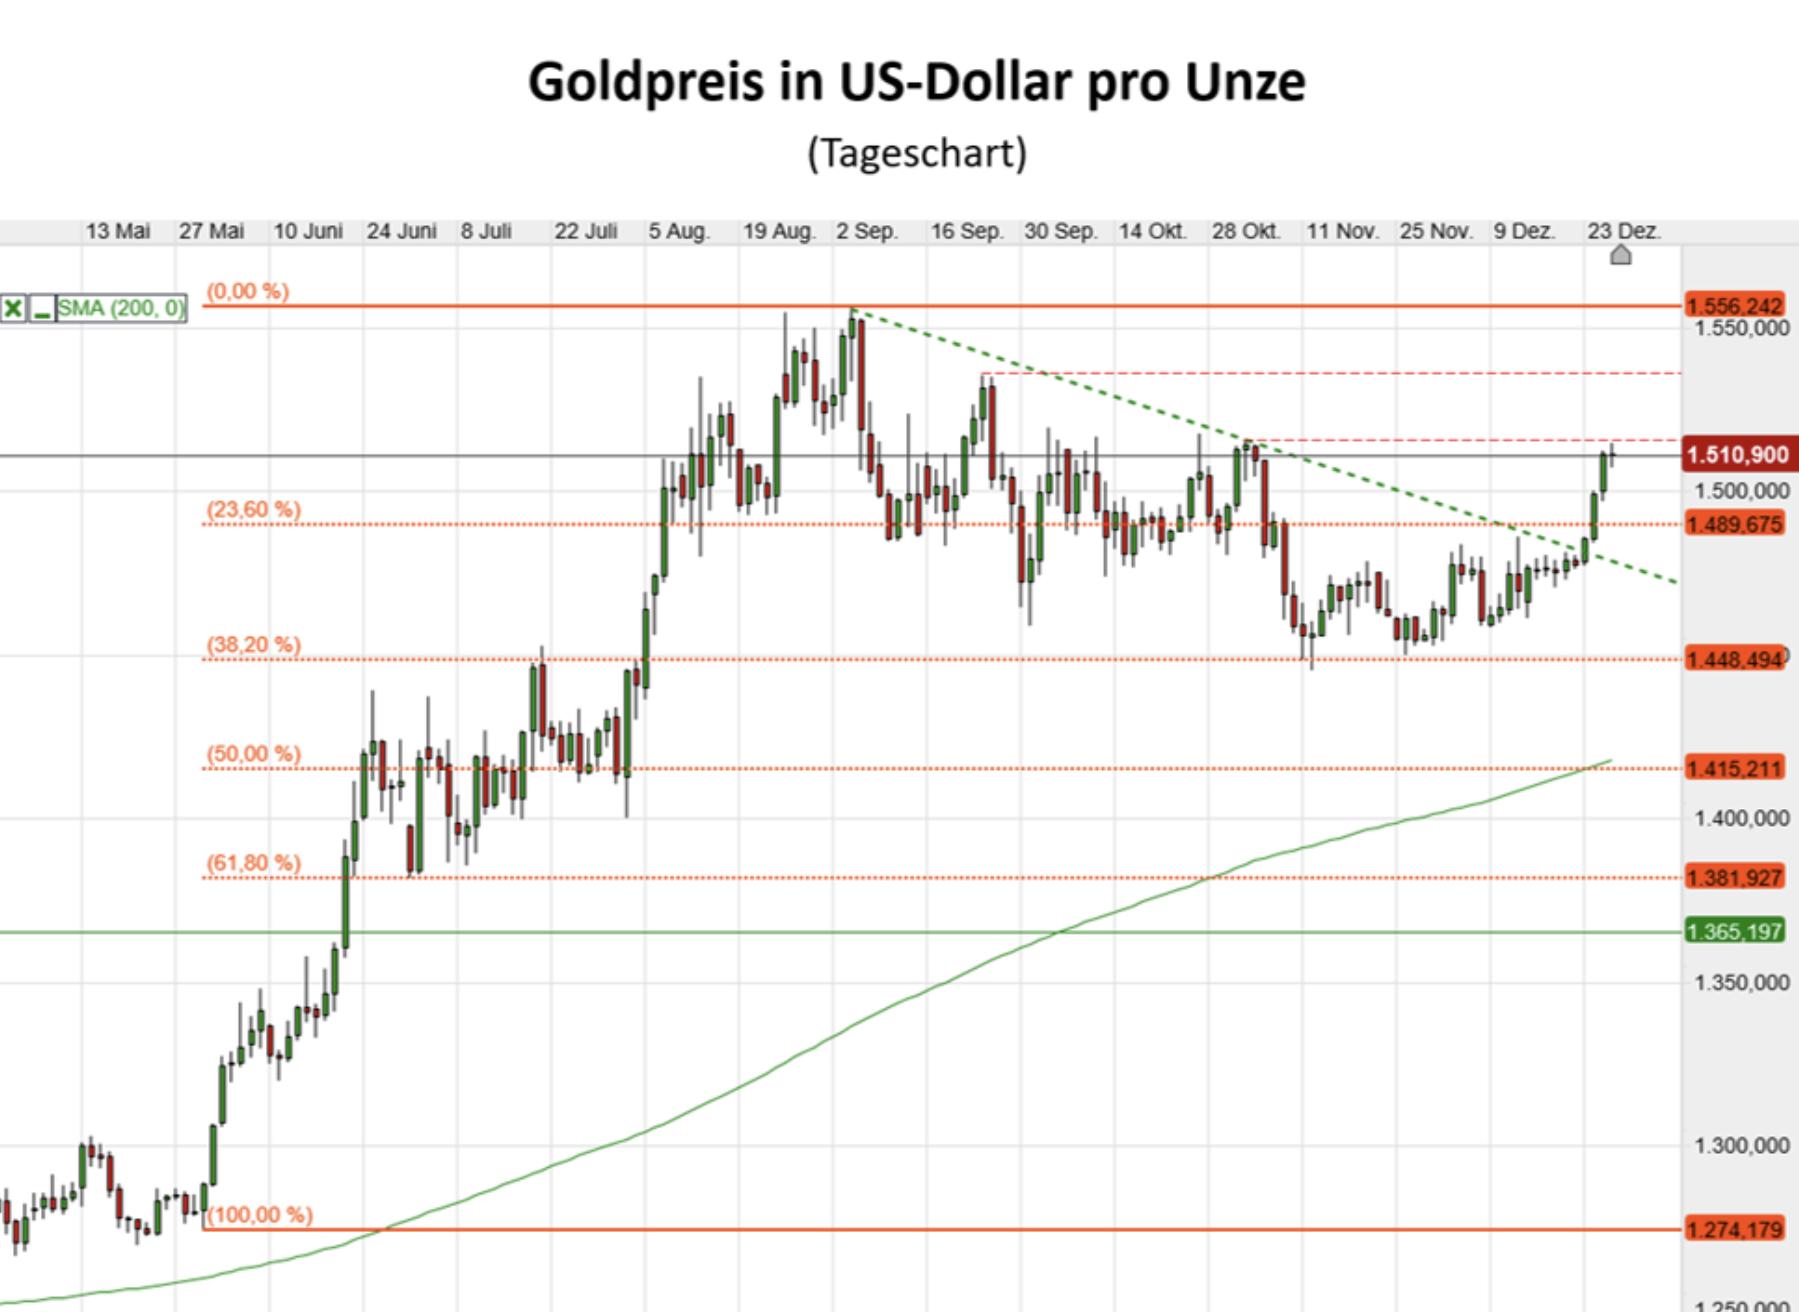 Goldpreis als Kursverlauf